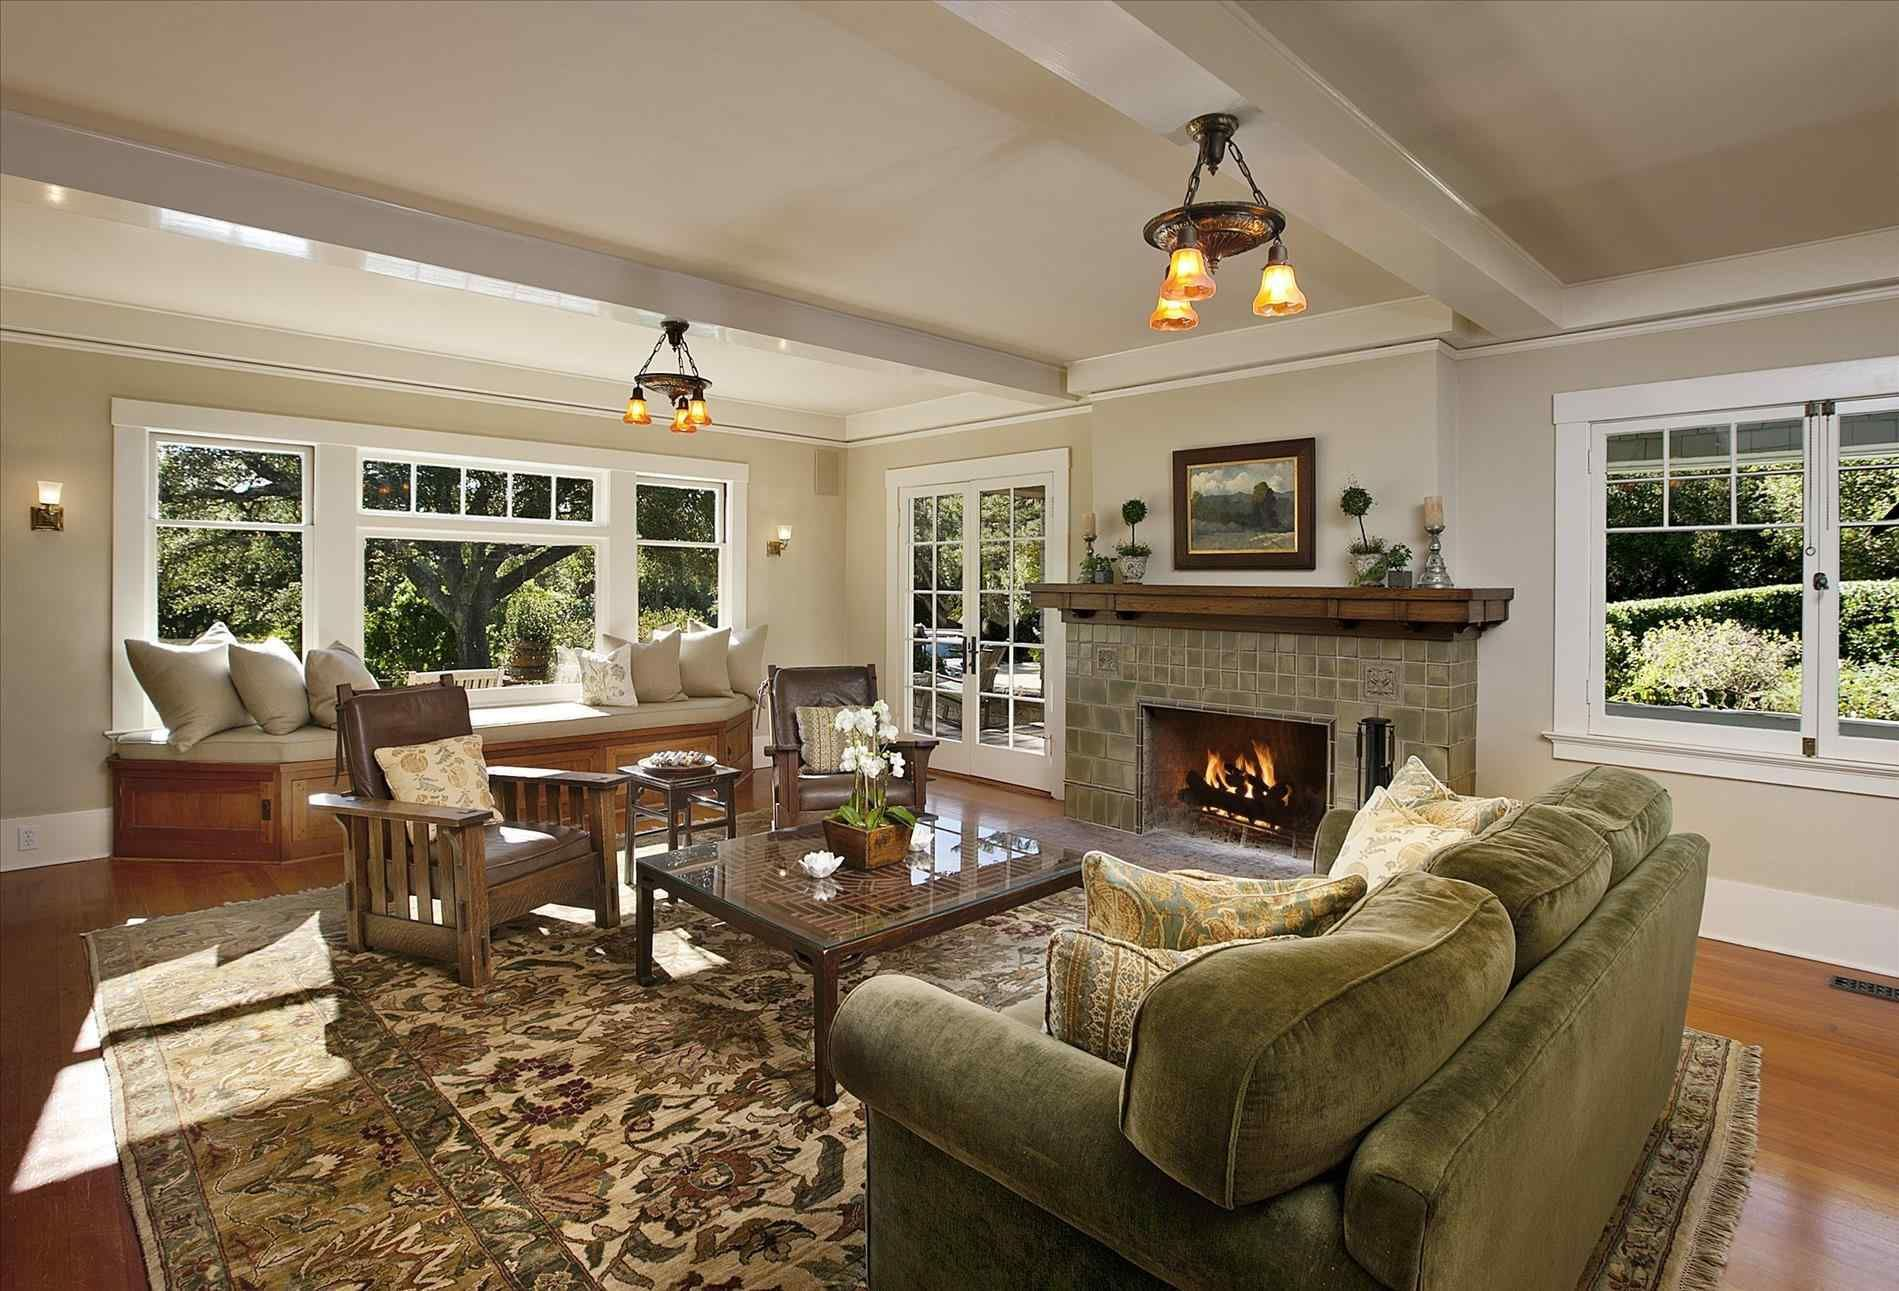 Living room furniture furniture craftsman home interiors craftsman interior craftsman homes bungalow interiors craftsman decor